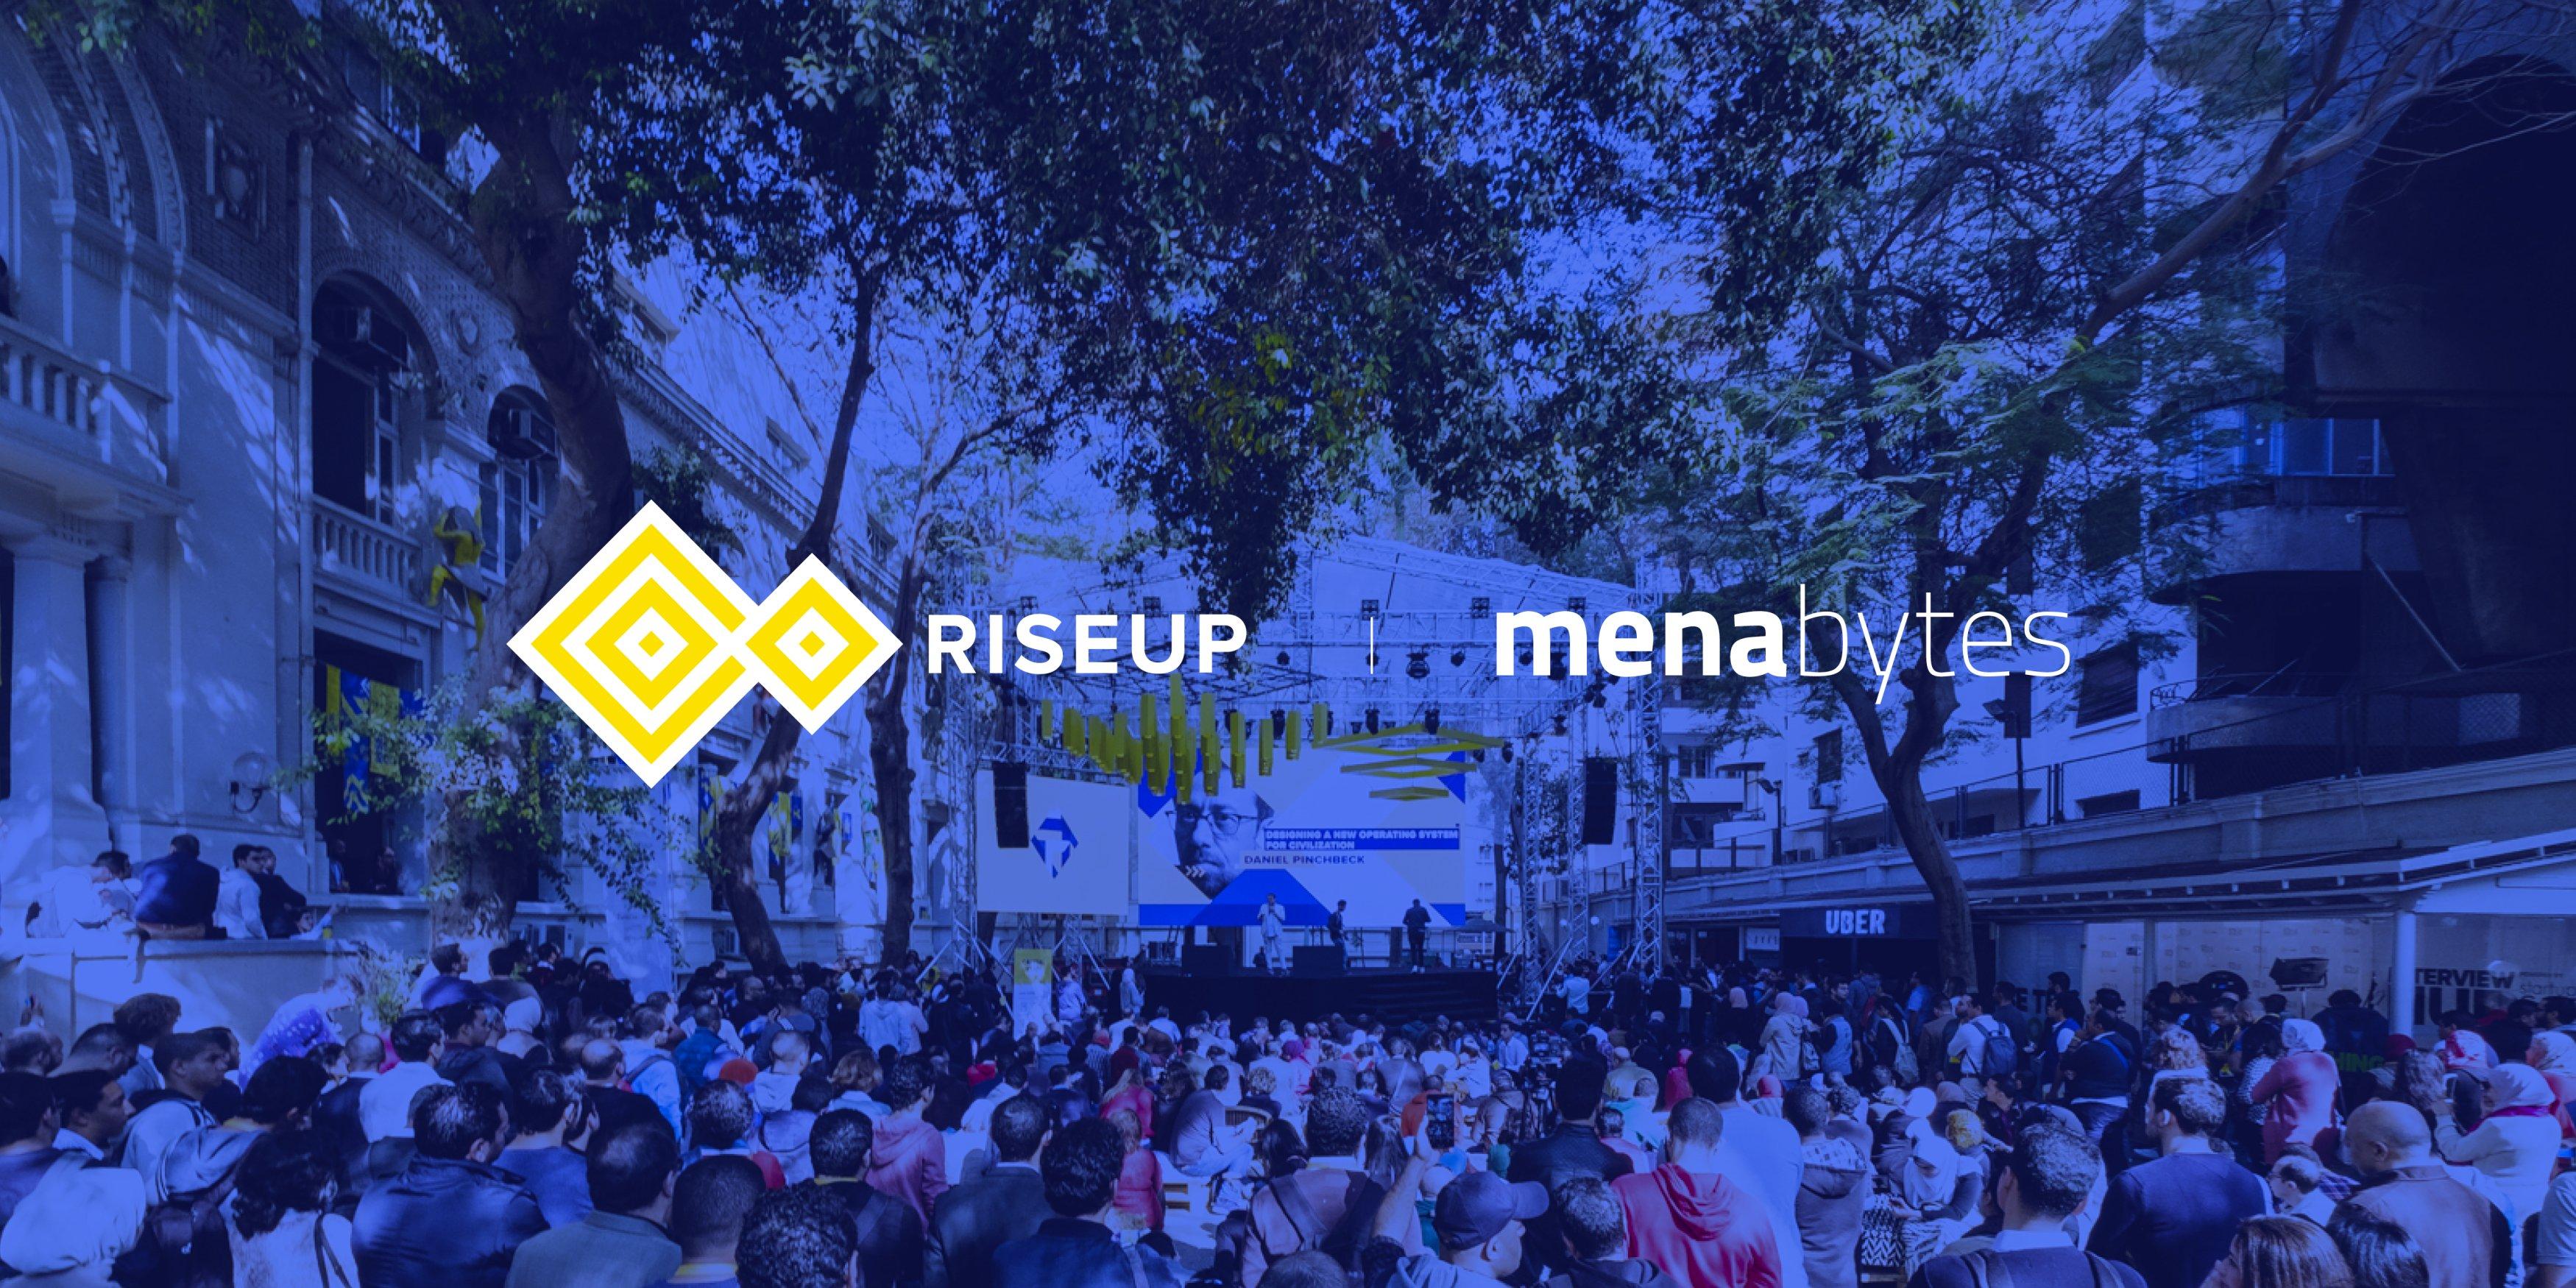 RISEUP ACQUIRES MENABYTES, ONLINE STARTUP AND TECHNOLOGY MEDIA PLATFORM |  EgyptInnovate